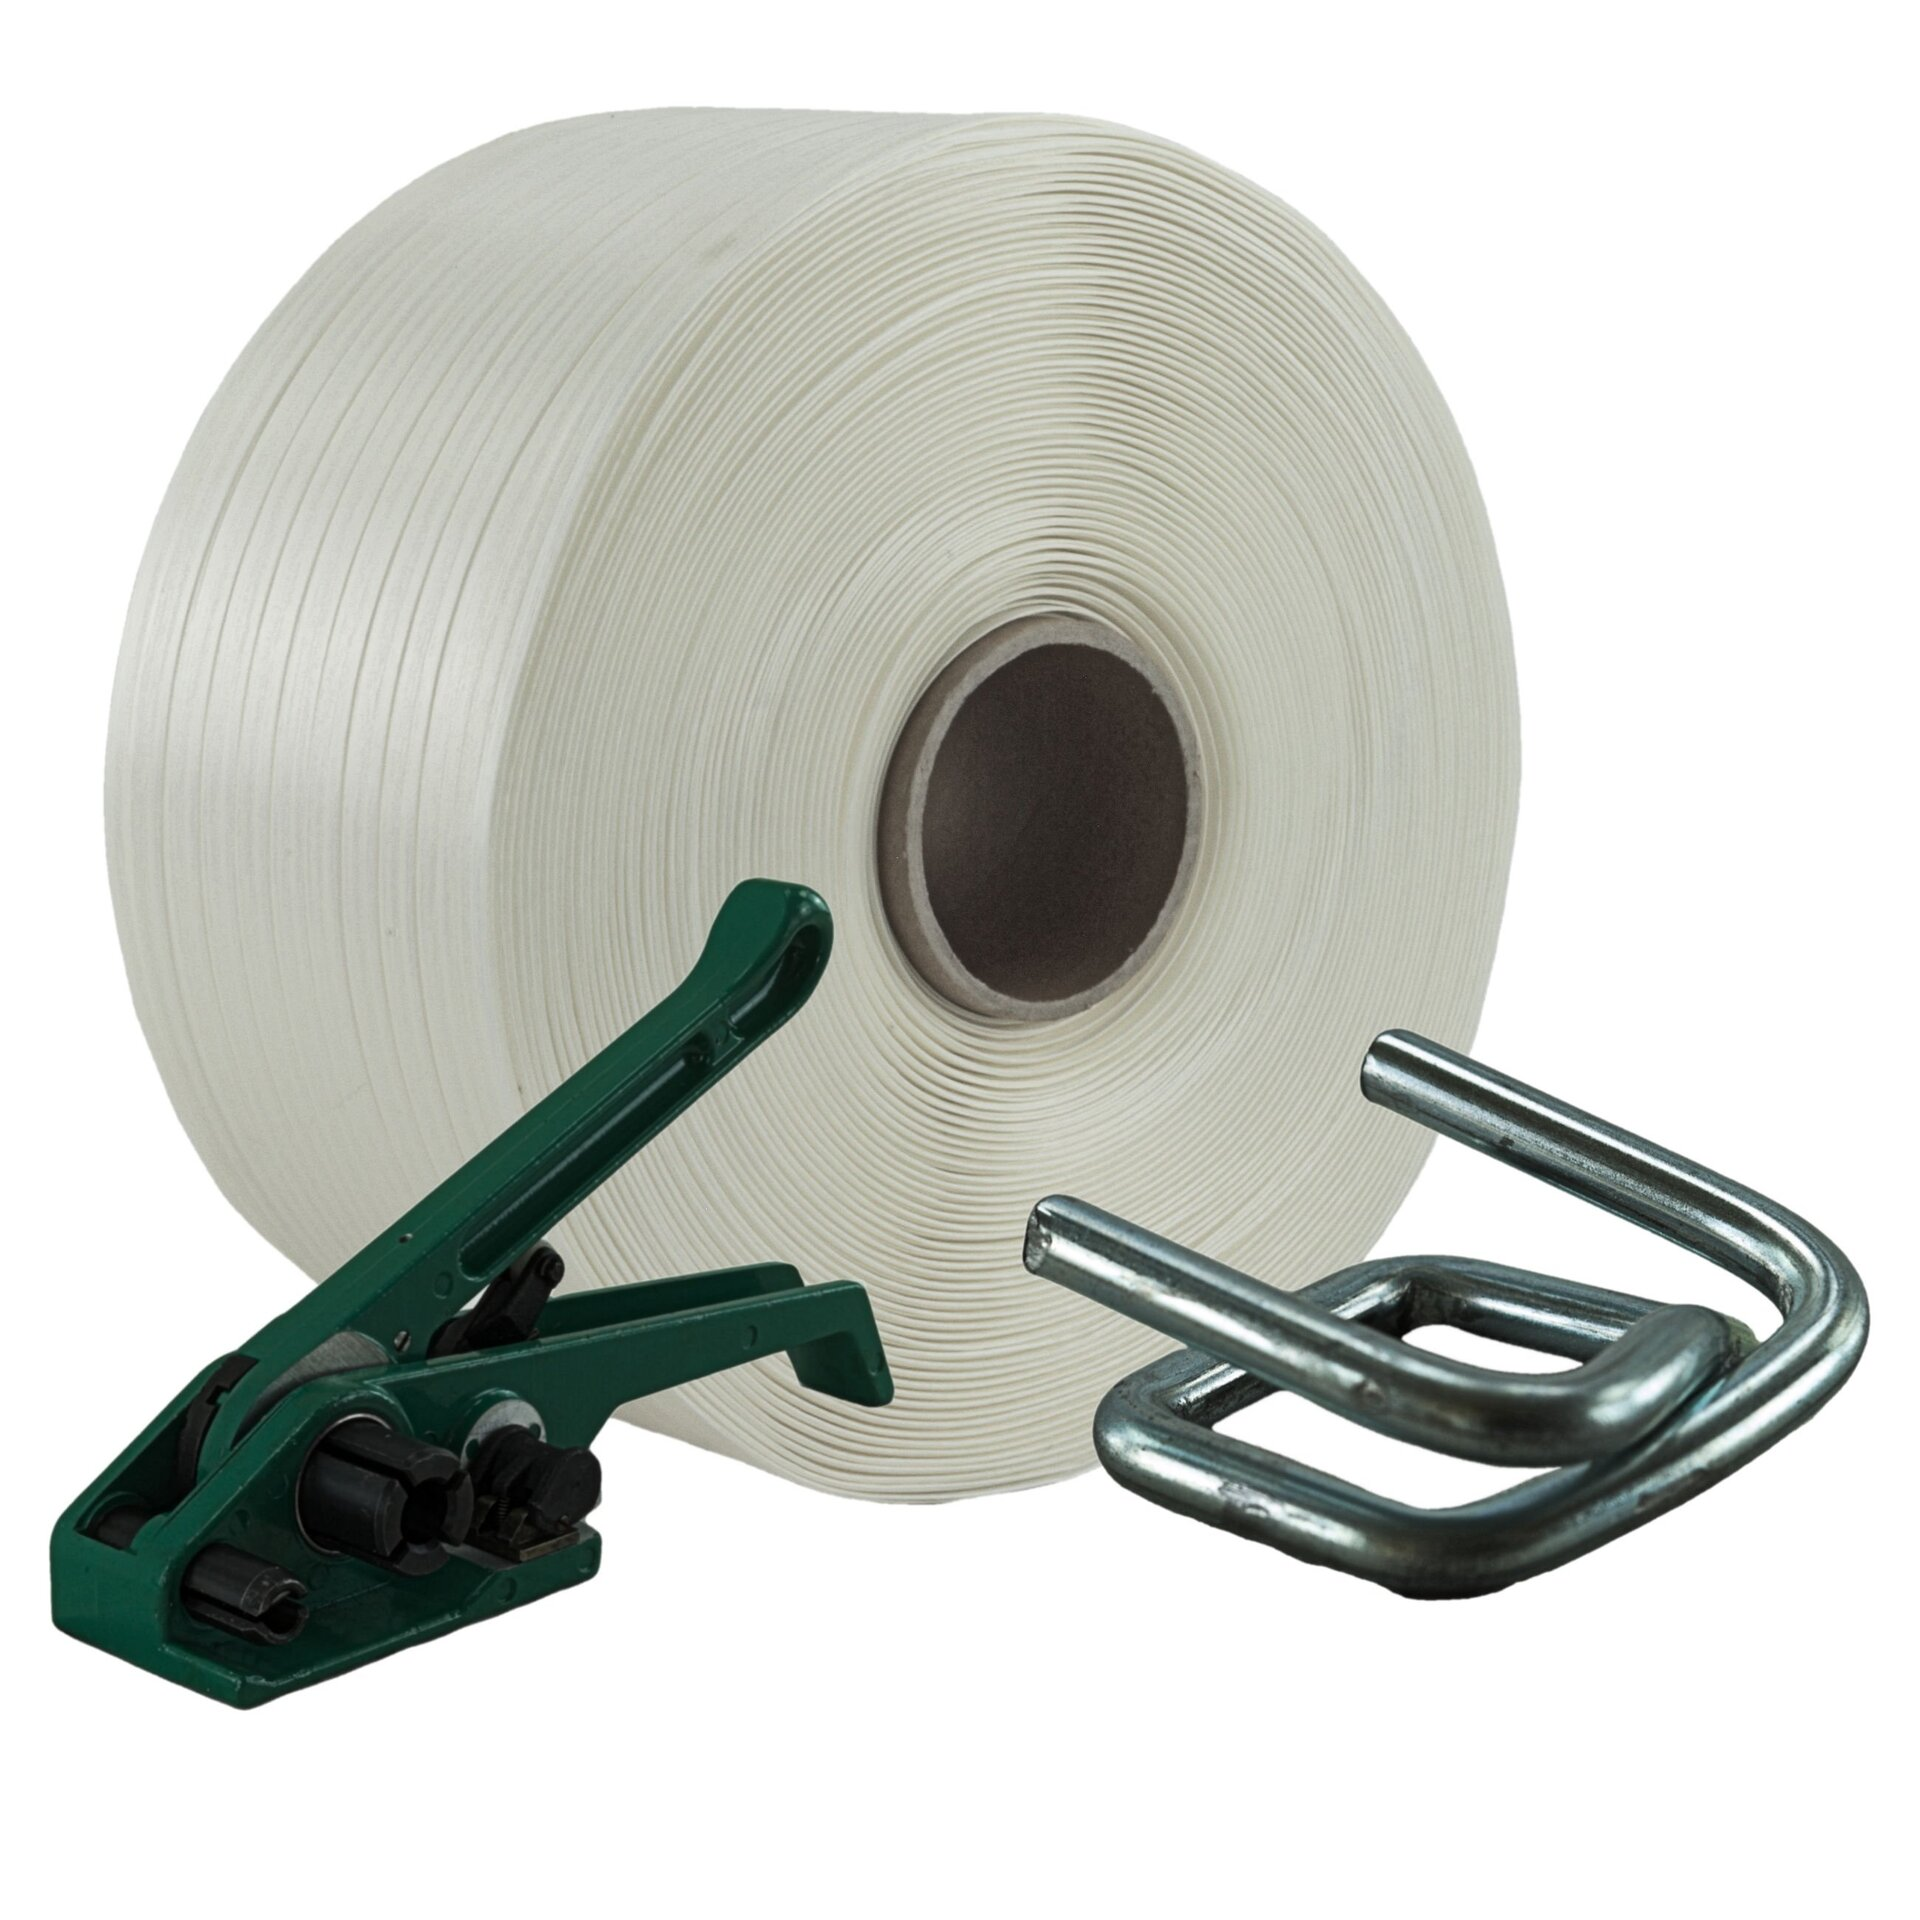 500 Metallklemmen Verzinkt 32-35 mm Umreifungsband Textil